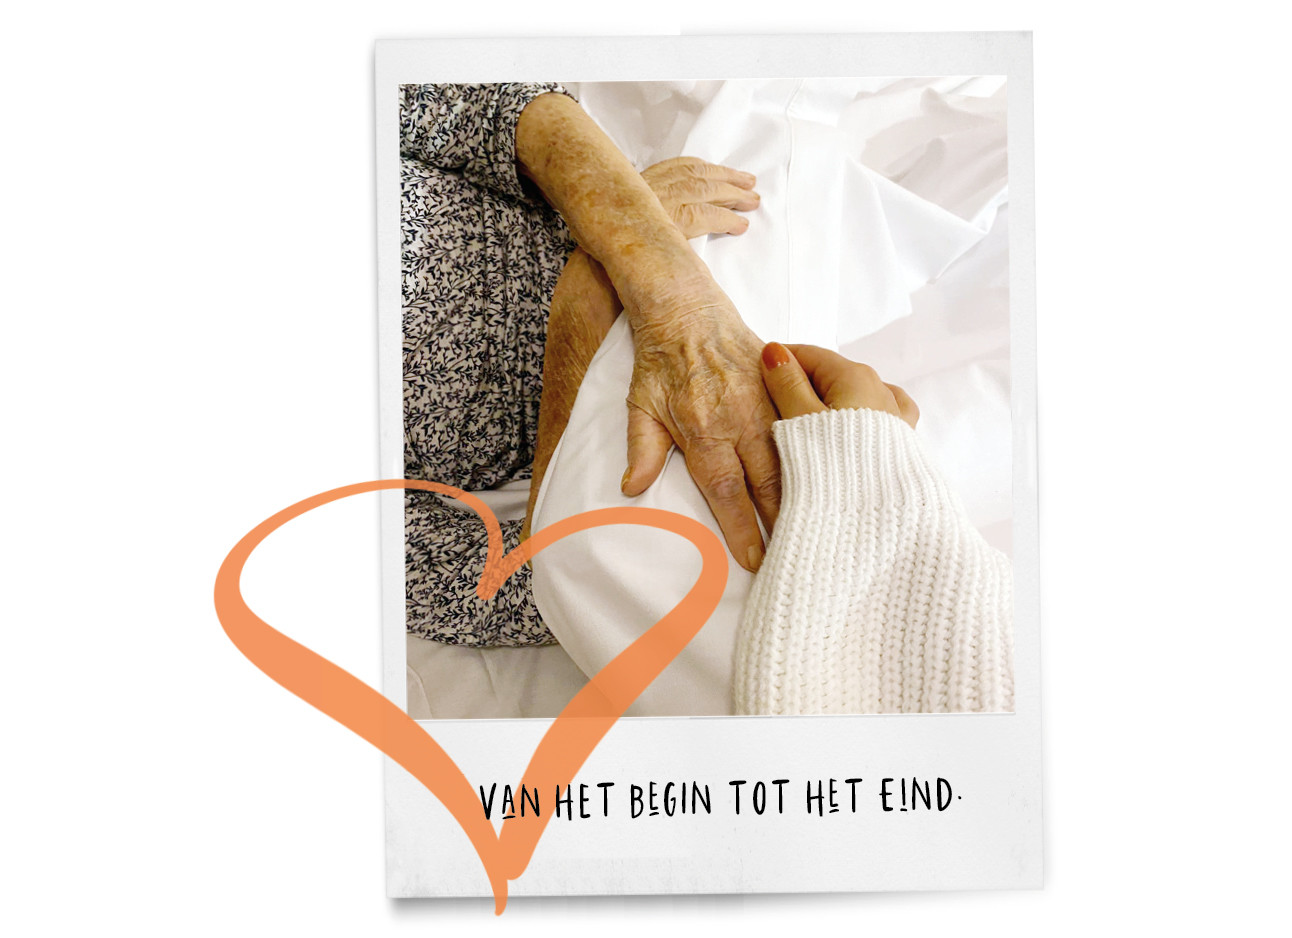 kiki en oma handen vast houden